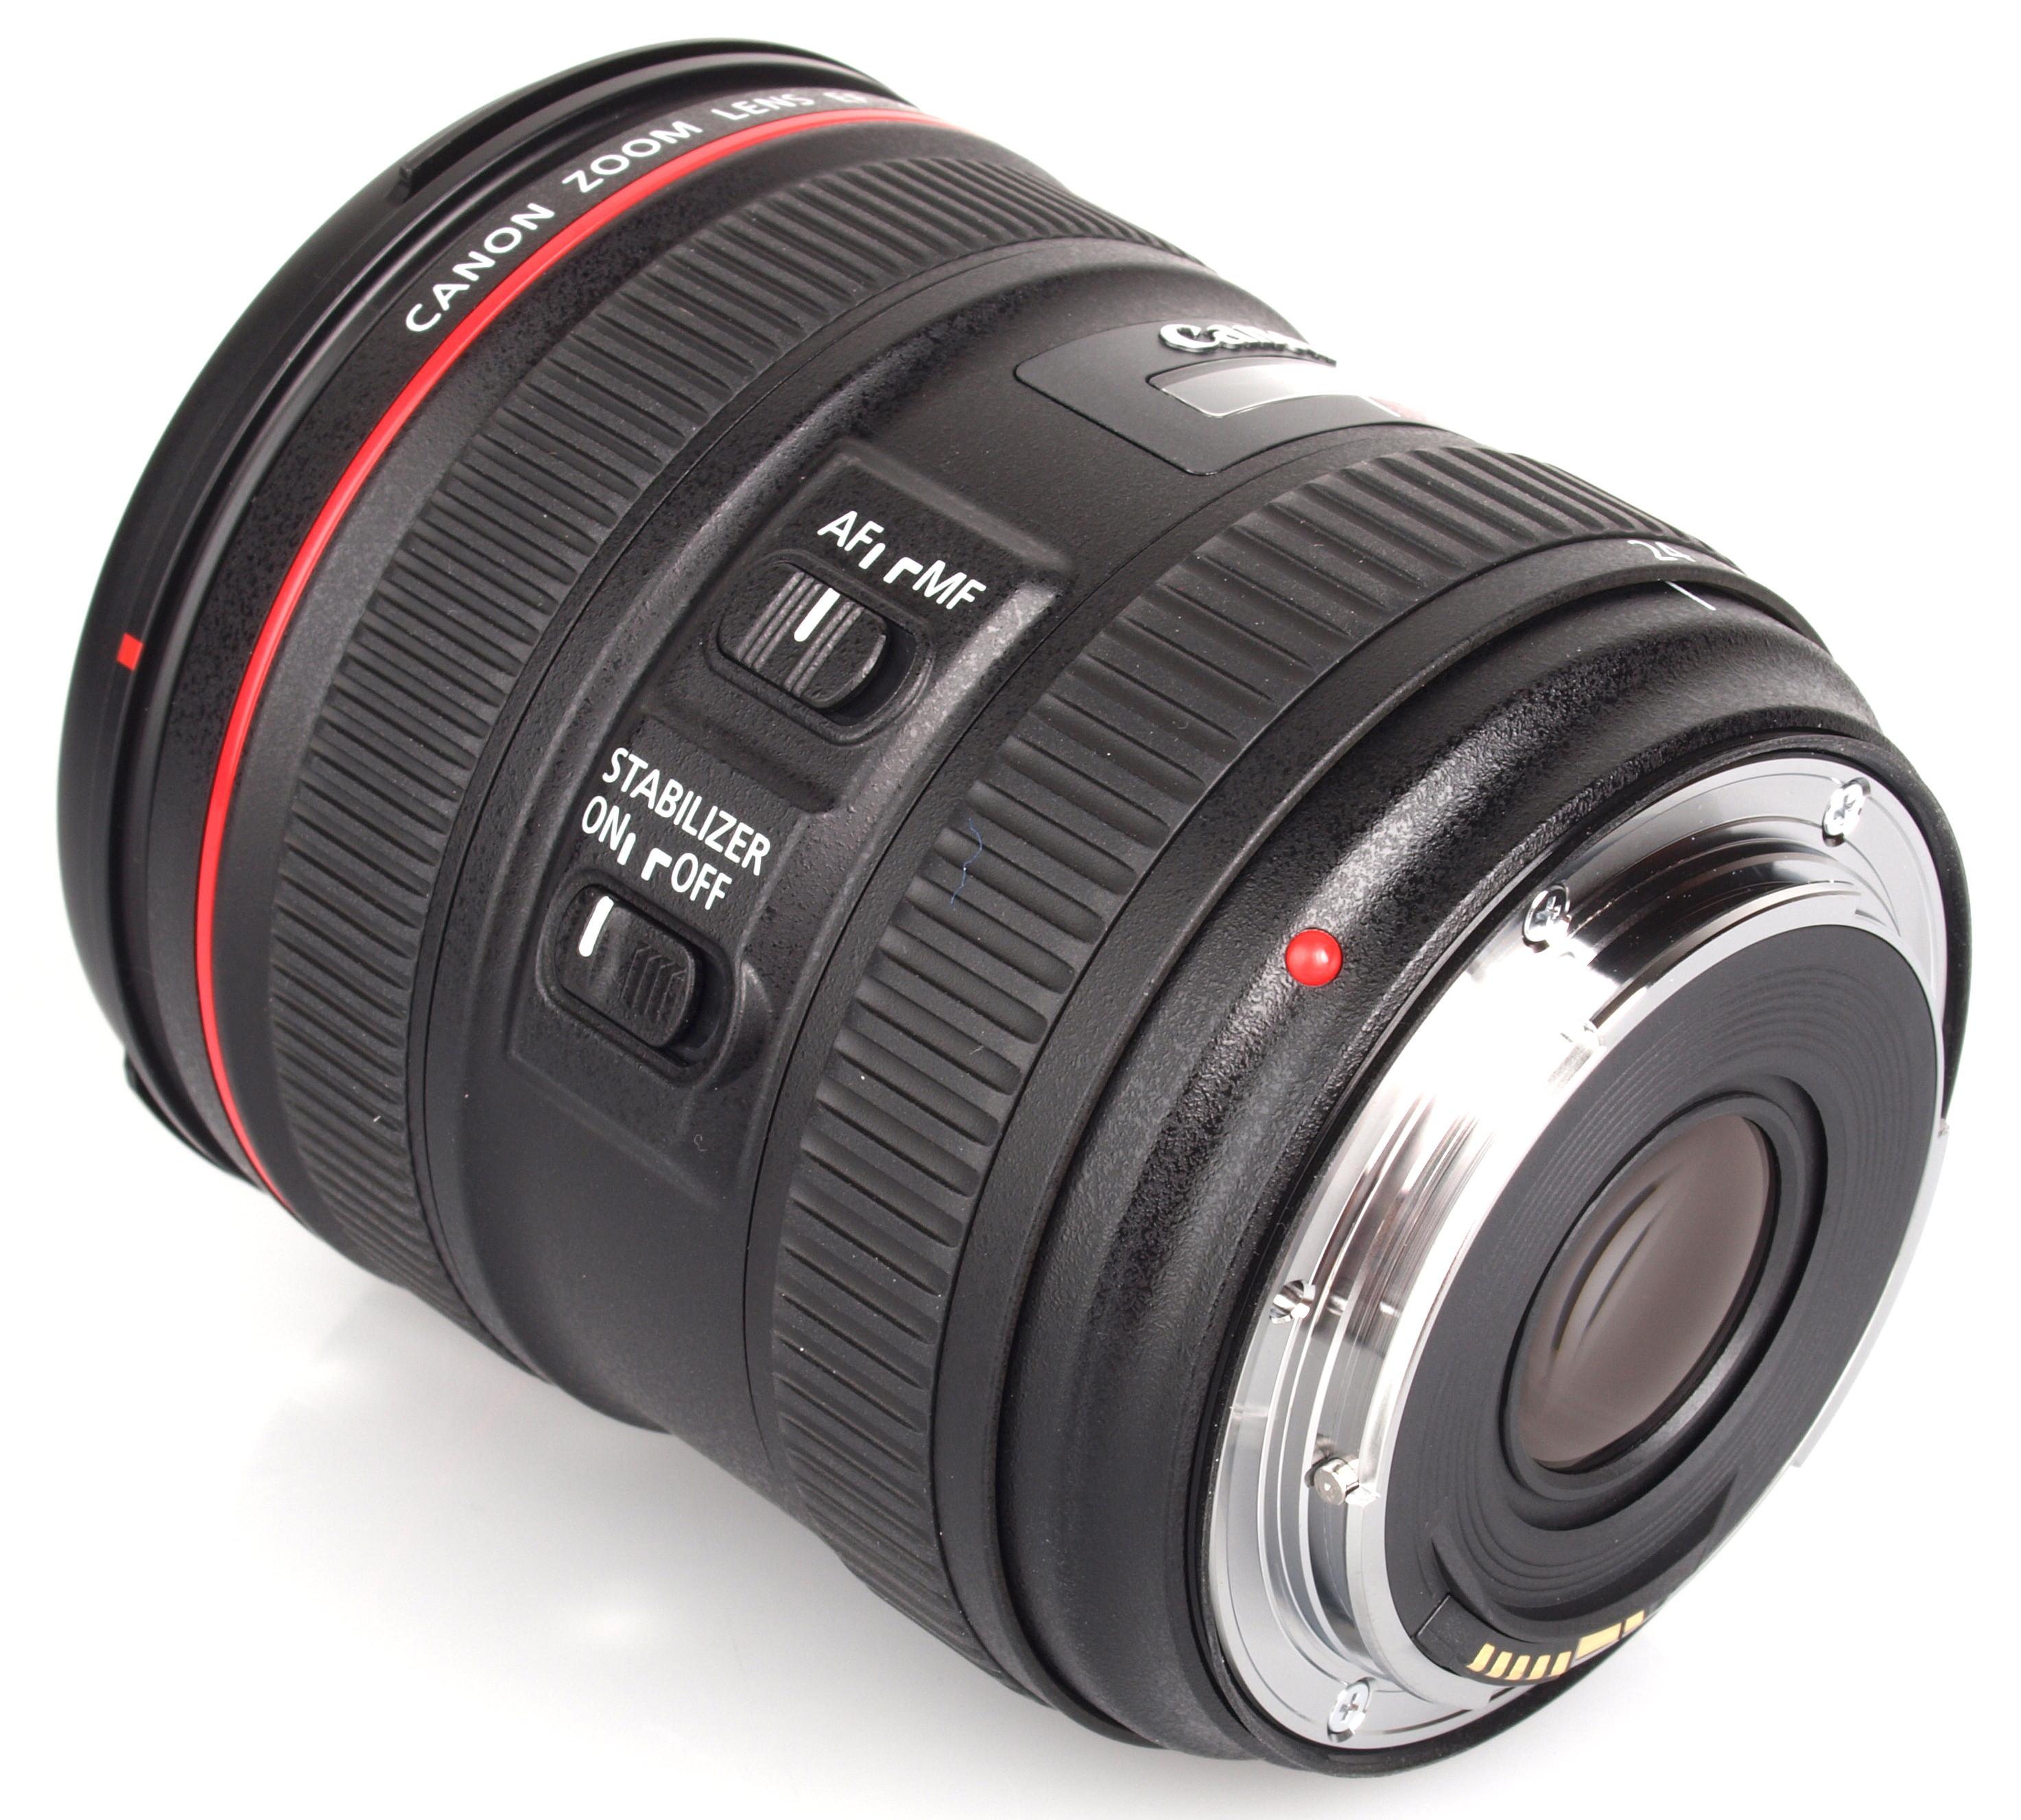 Canon EF 24-70mm f/4L USM Lens Review